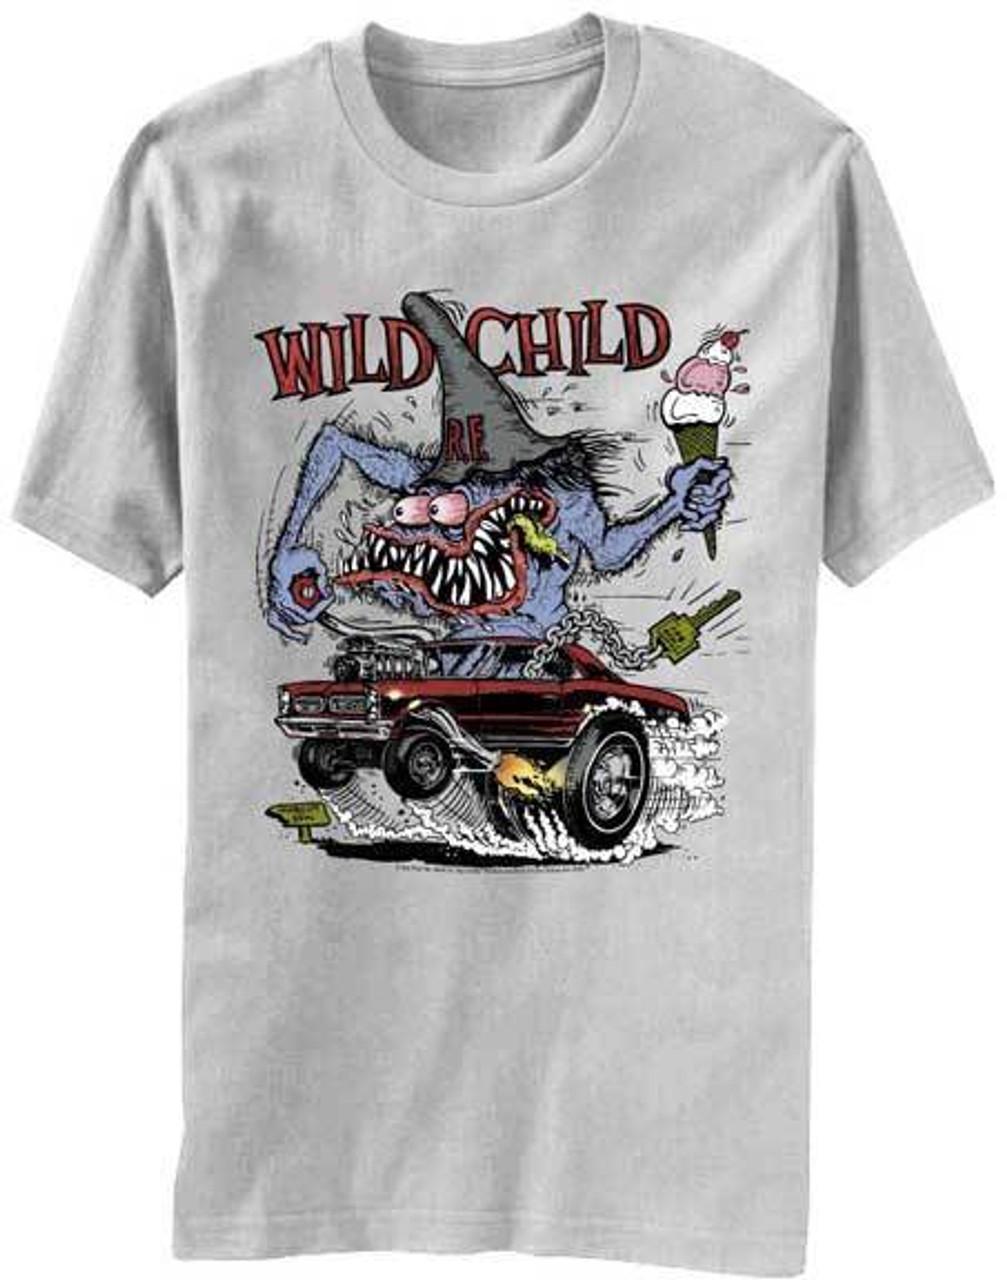 Hot Rod T Shirts >> Rat Fink Wild Child Ed Big Daddy Ross Kustom Kulture Hot Rod T Shirt Bd002ig